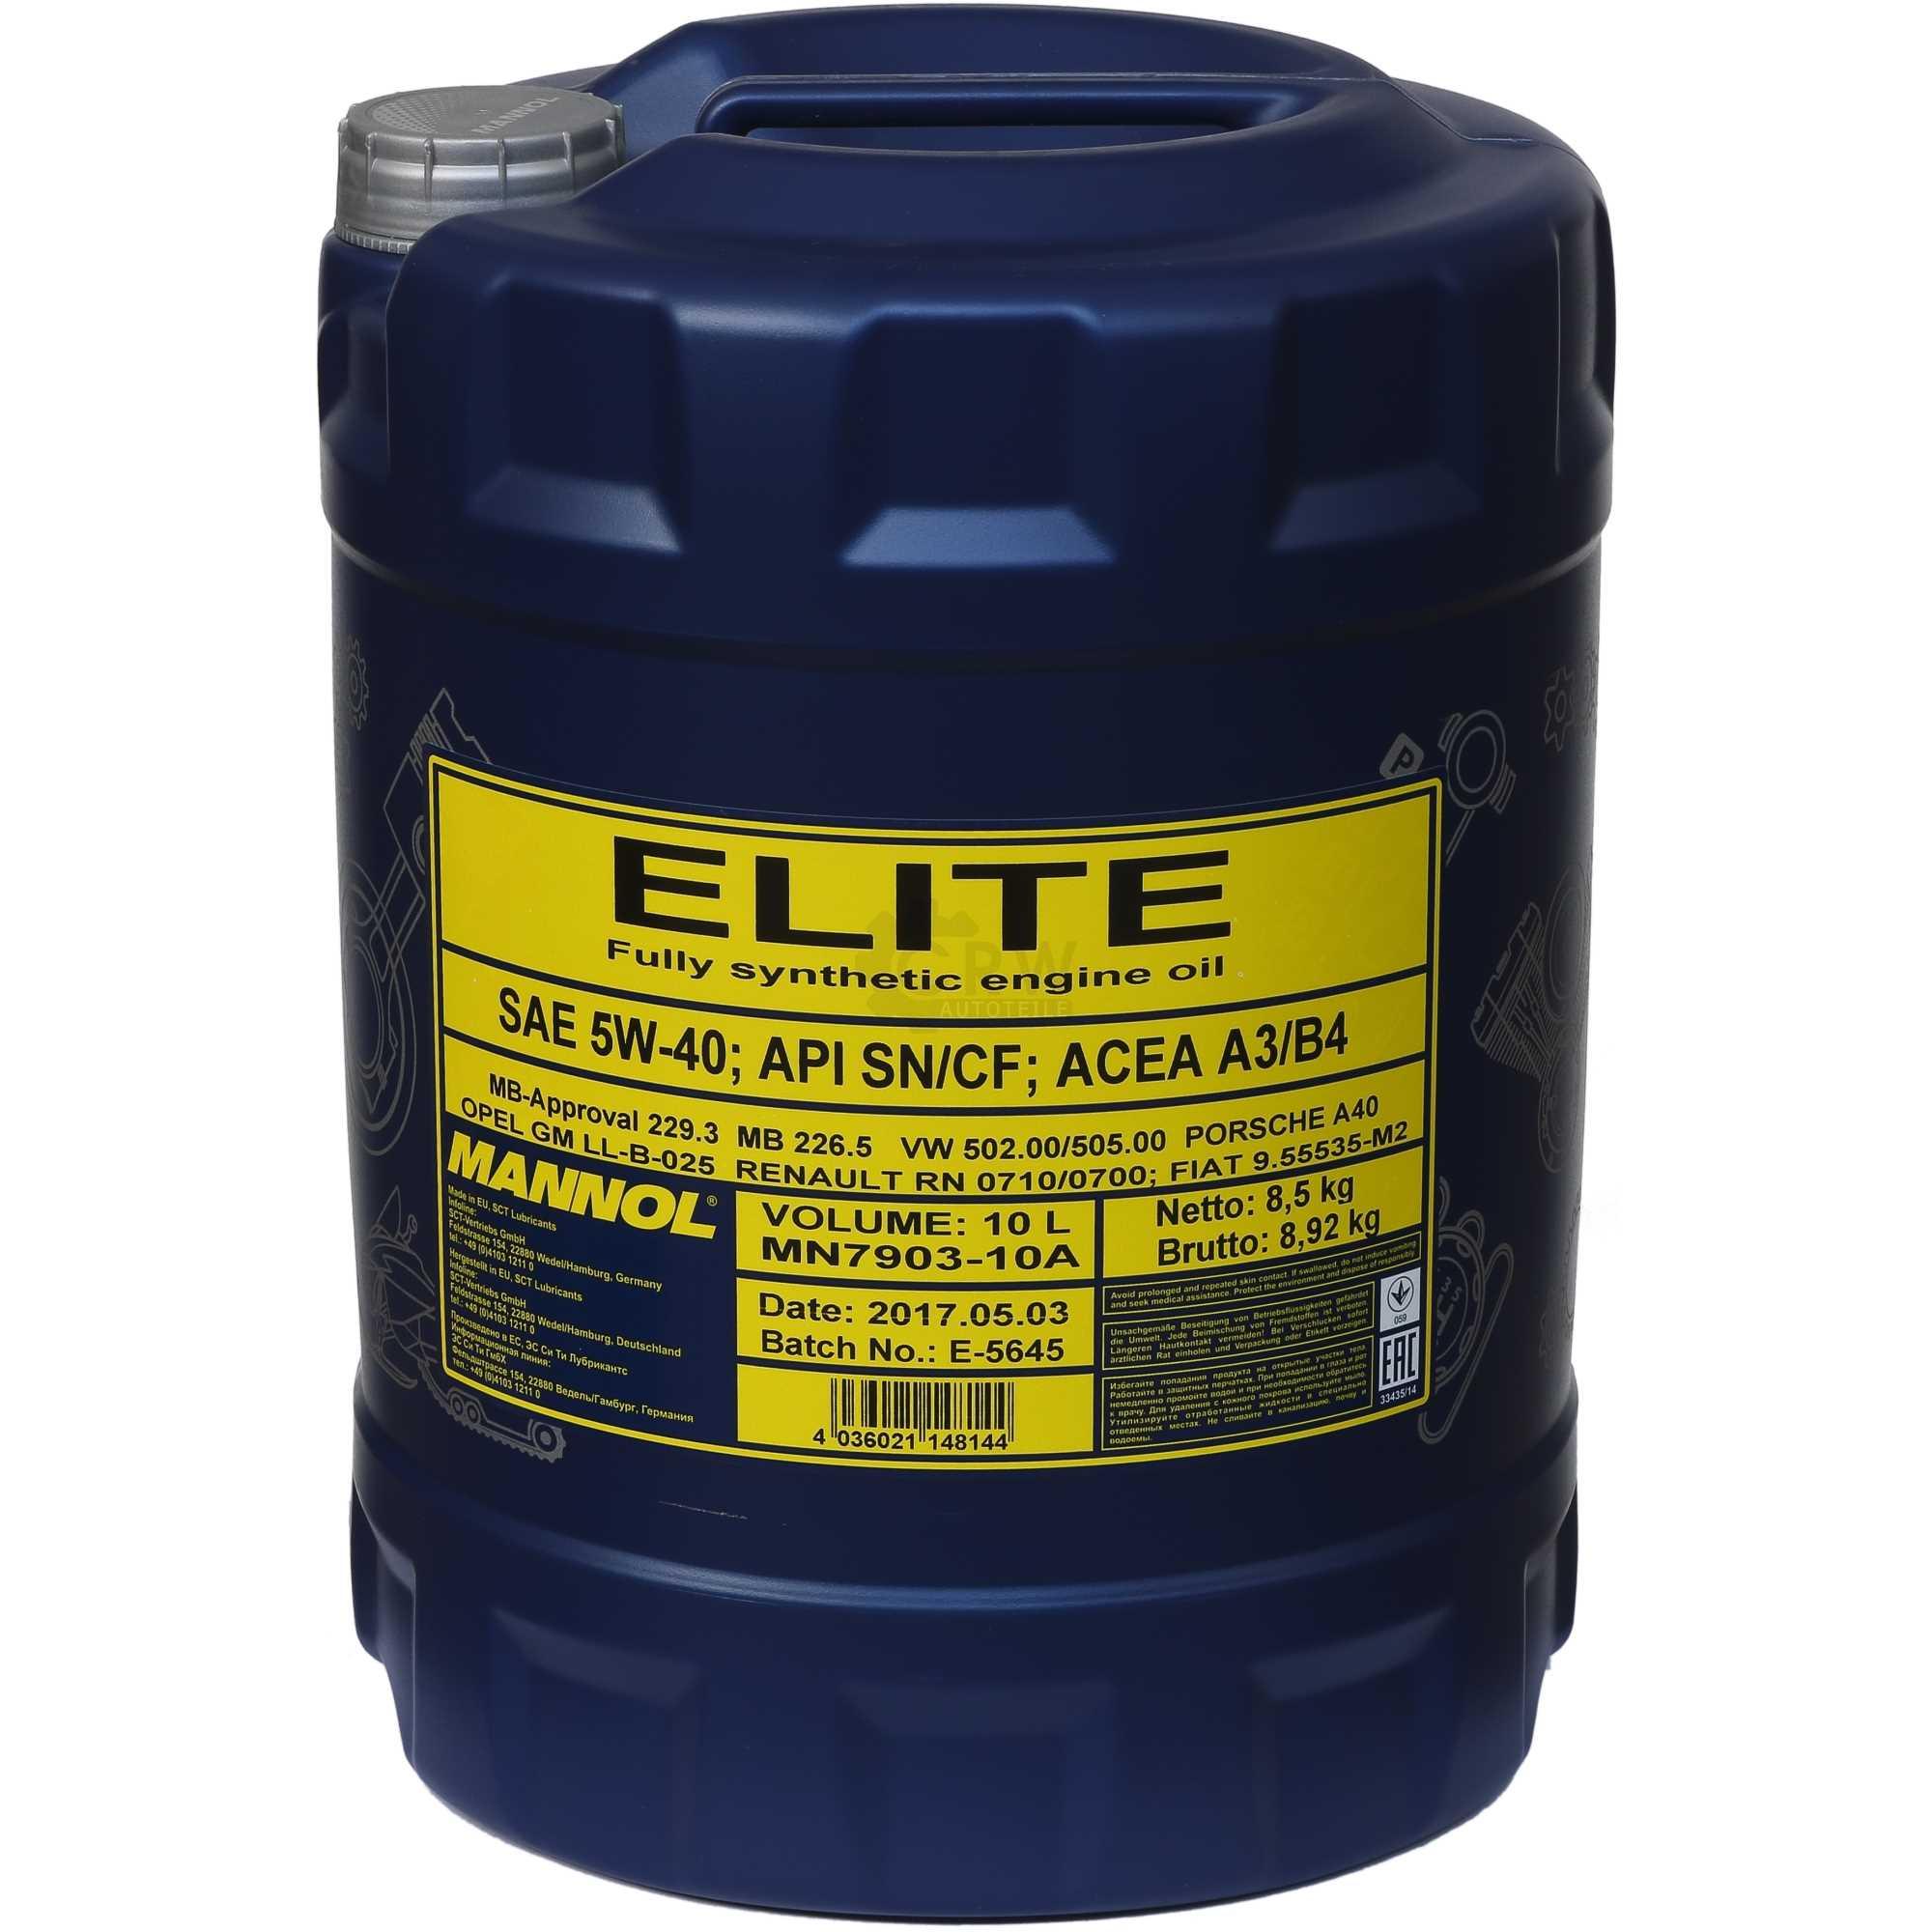 Aceite-del-motor-aceite-5w40-10w40-15w40-5w30-10w60-1l-4l-5l-7l-10l-20l miniatura 26